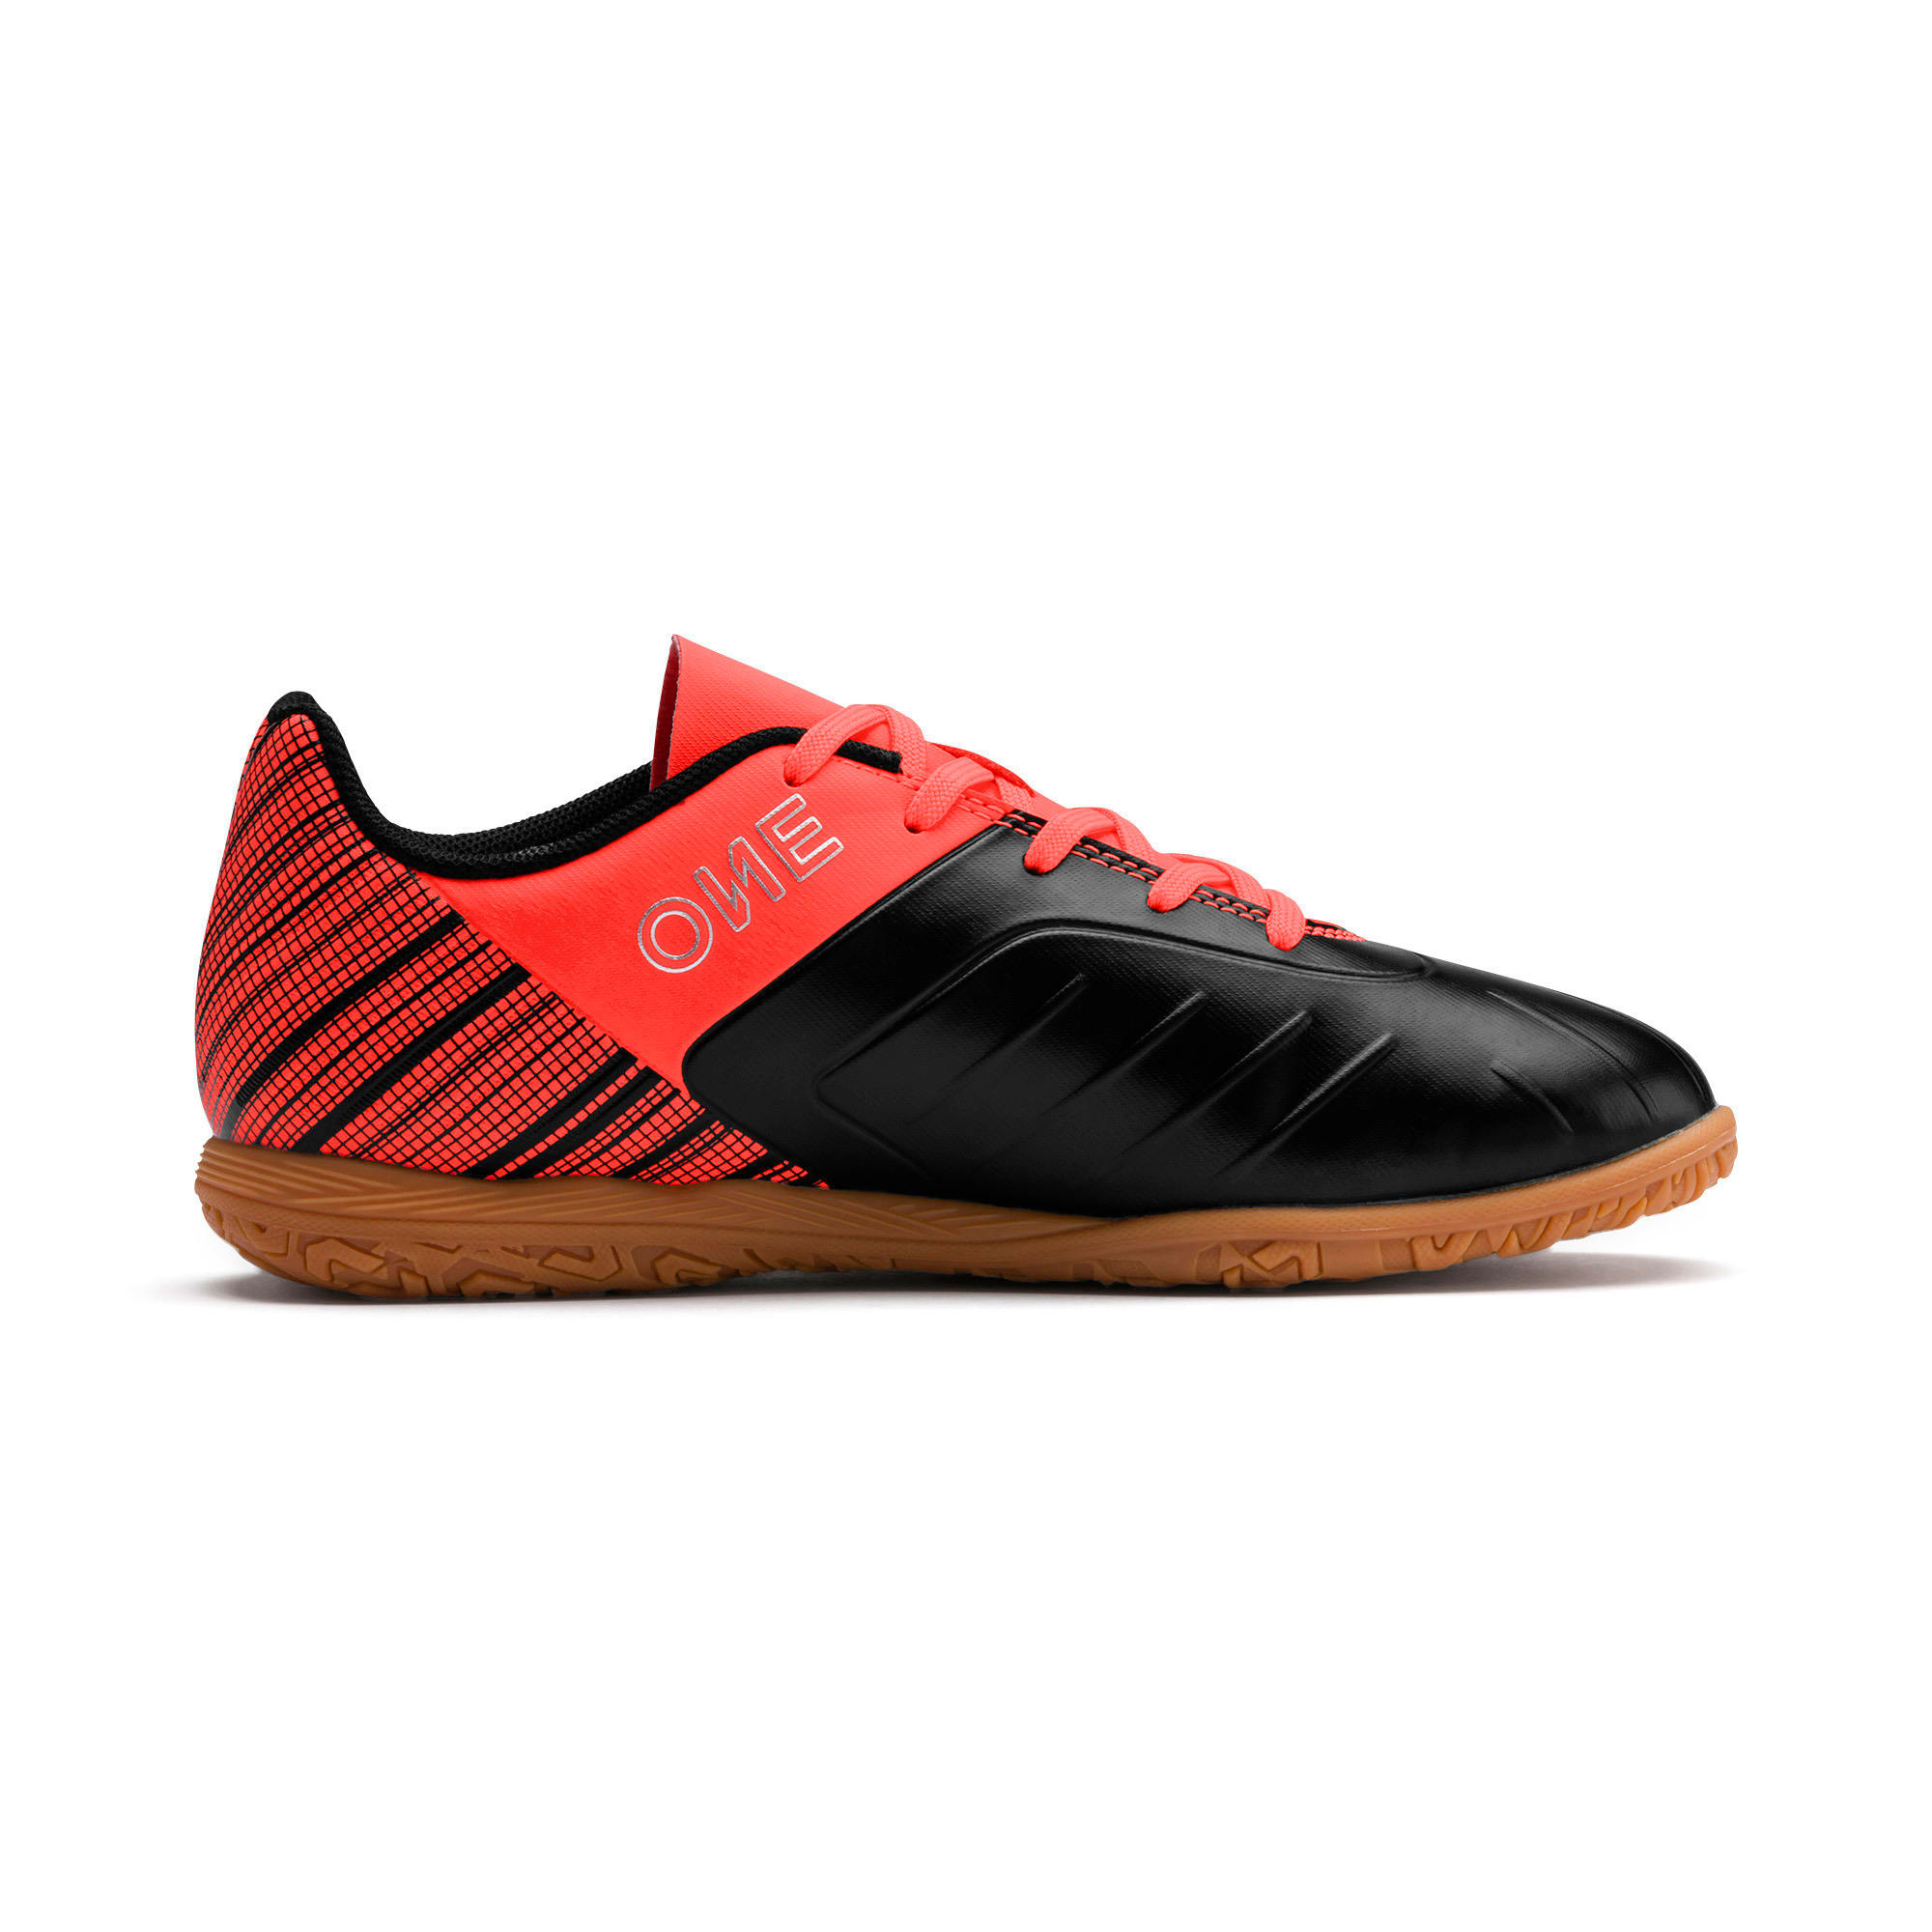 Miniatura 5 de Zapatos de fútbol PUMA ONE 5.4 IT JR, Black-Red-Aged Silver-Gum, mediano